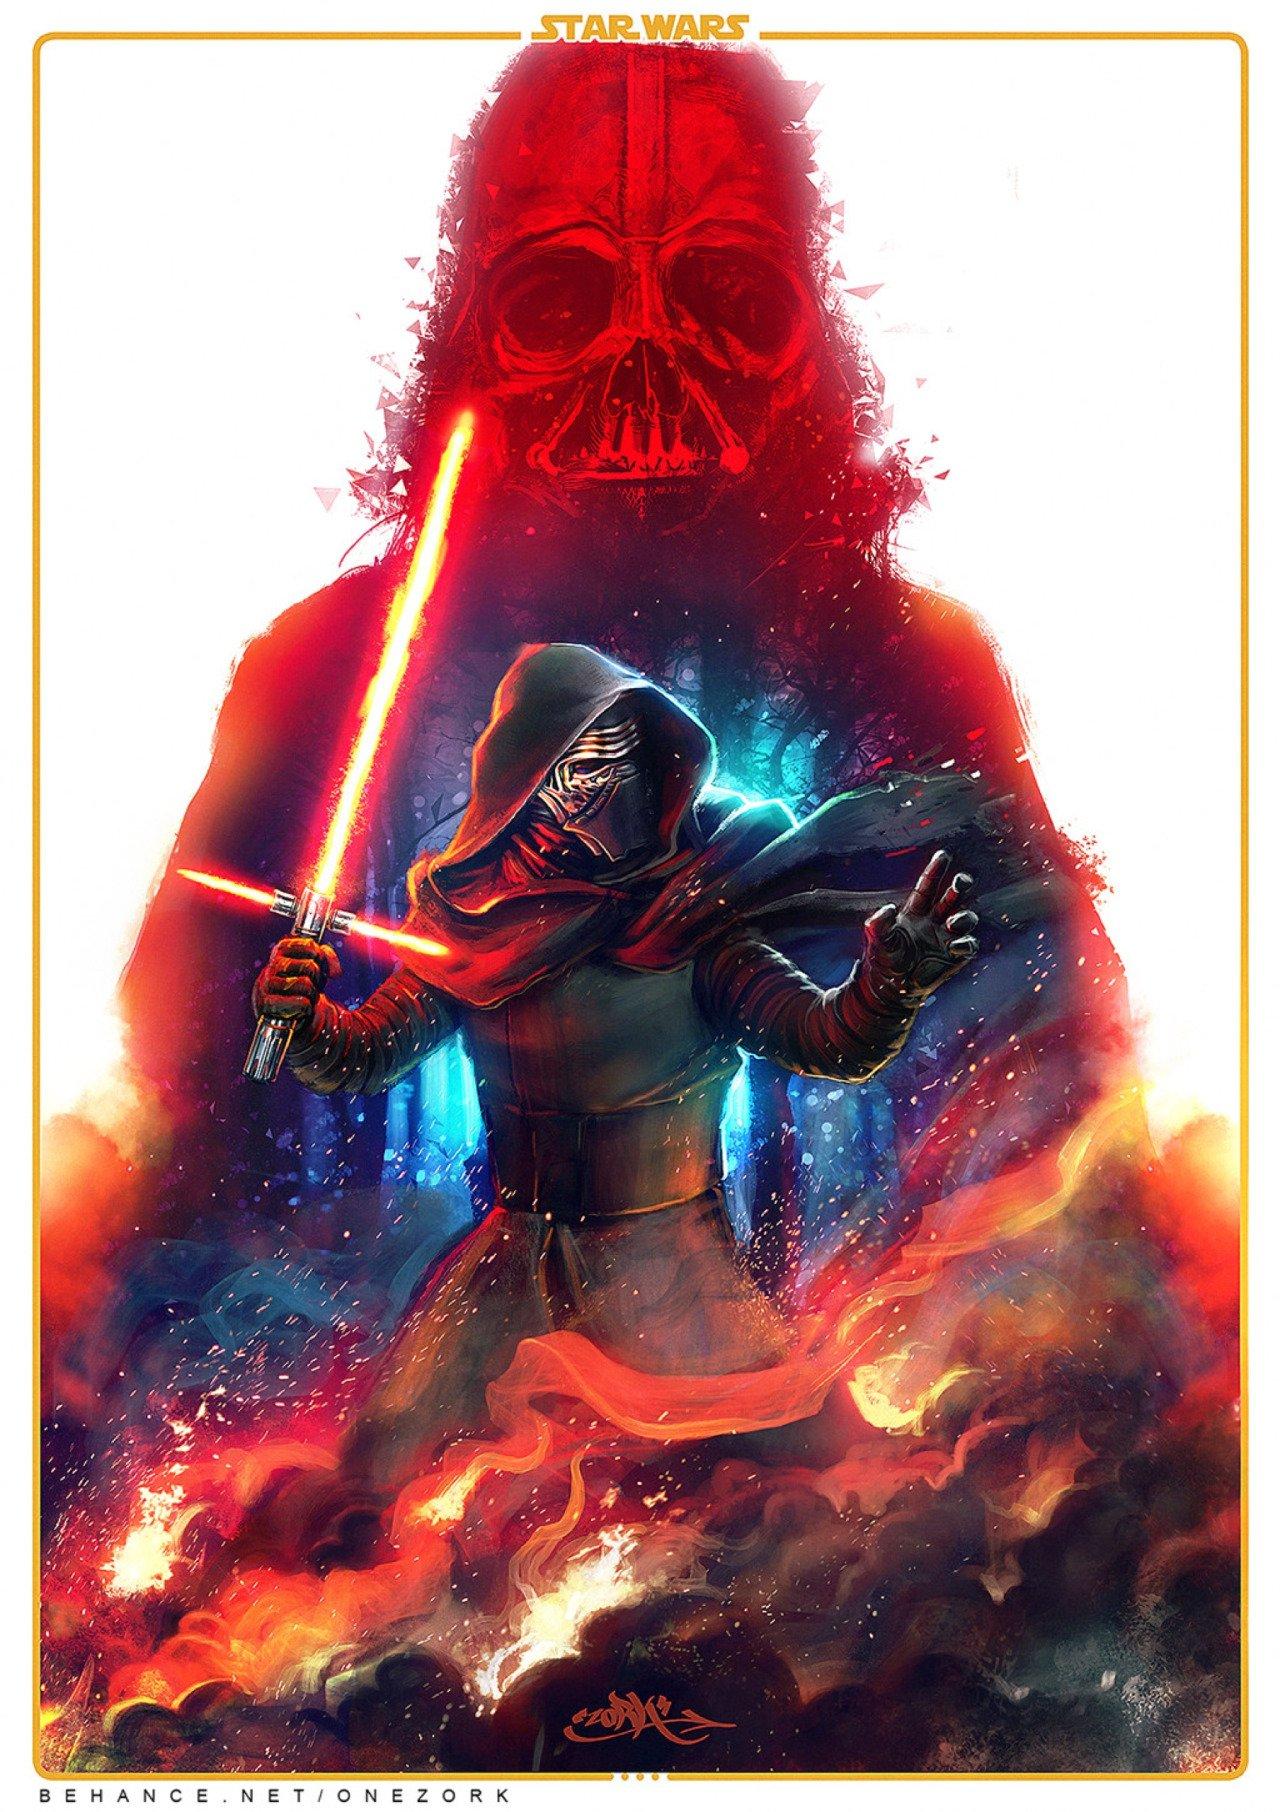 The Force Awakens par Nestor Marinero #starwars #TheForceAwakens #Lereveildelaforce https://t.co/mxEwwfuVwZ